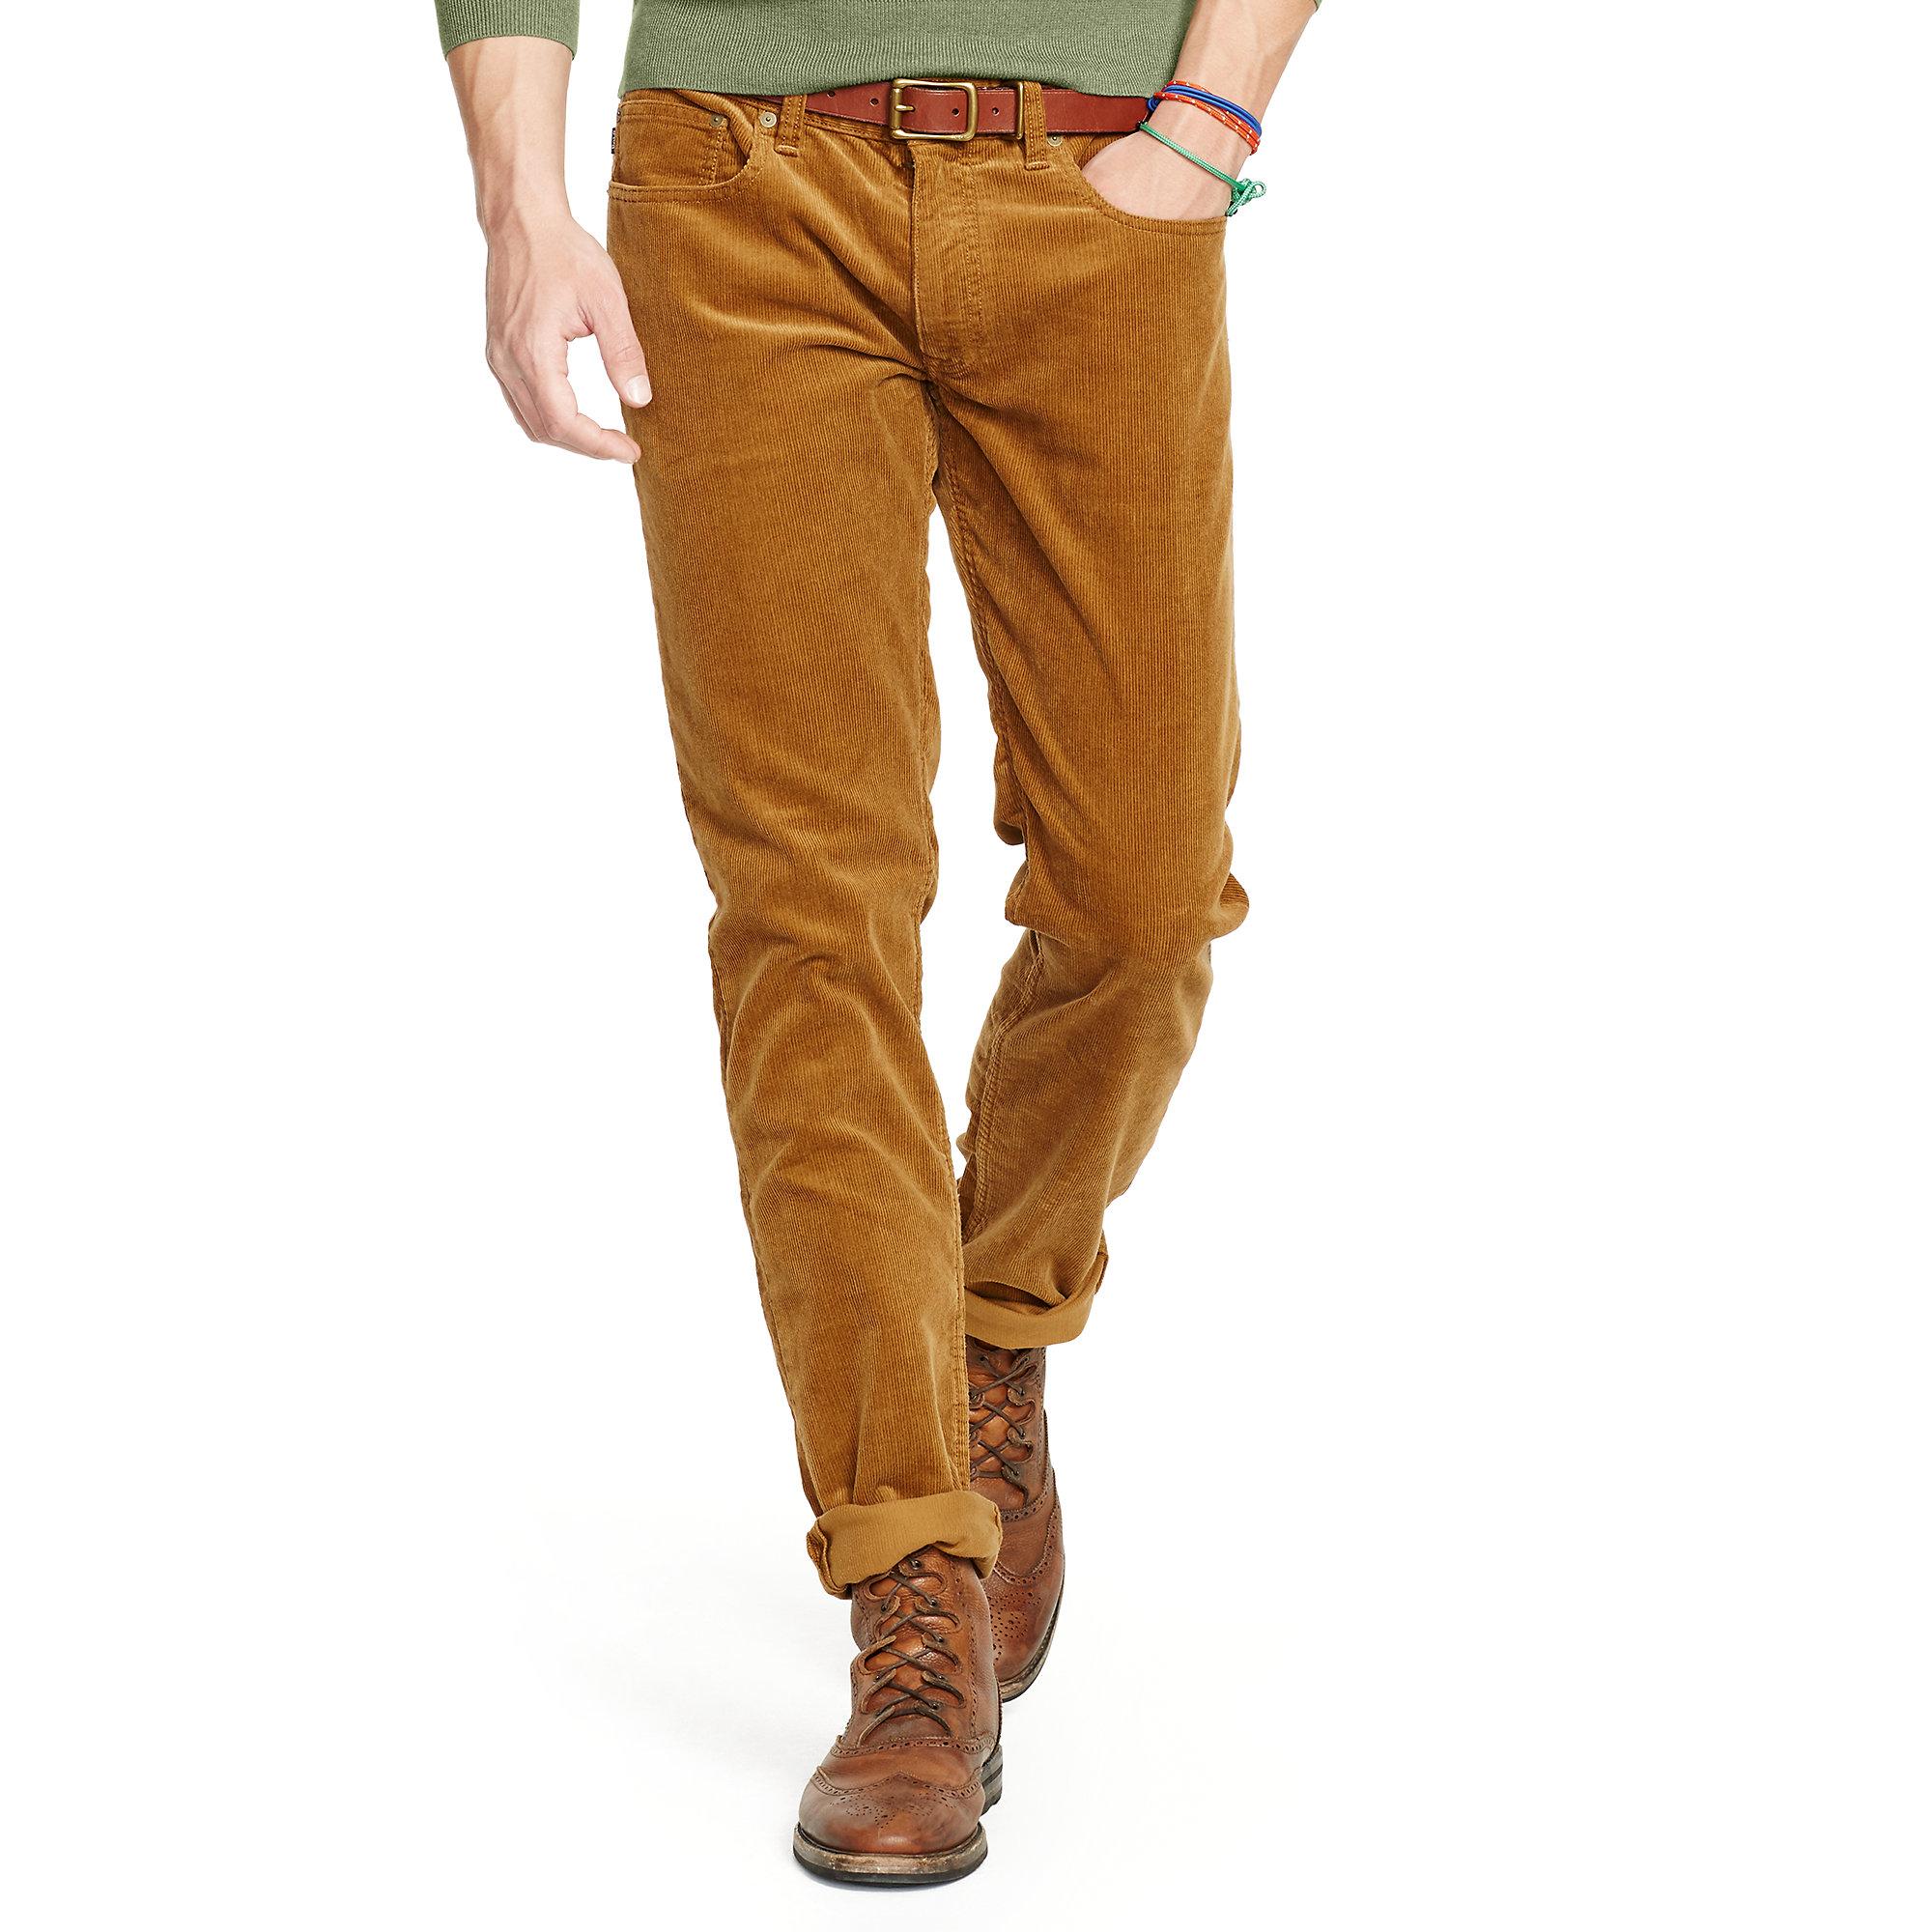 Beautiful  Jeans Brixton Slim Straight Leg Corduroy Pants In Brown For Men Tan